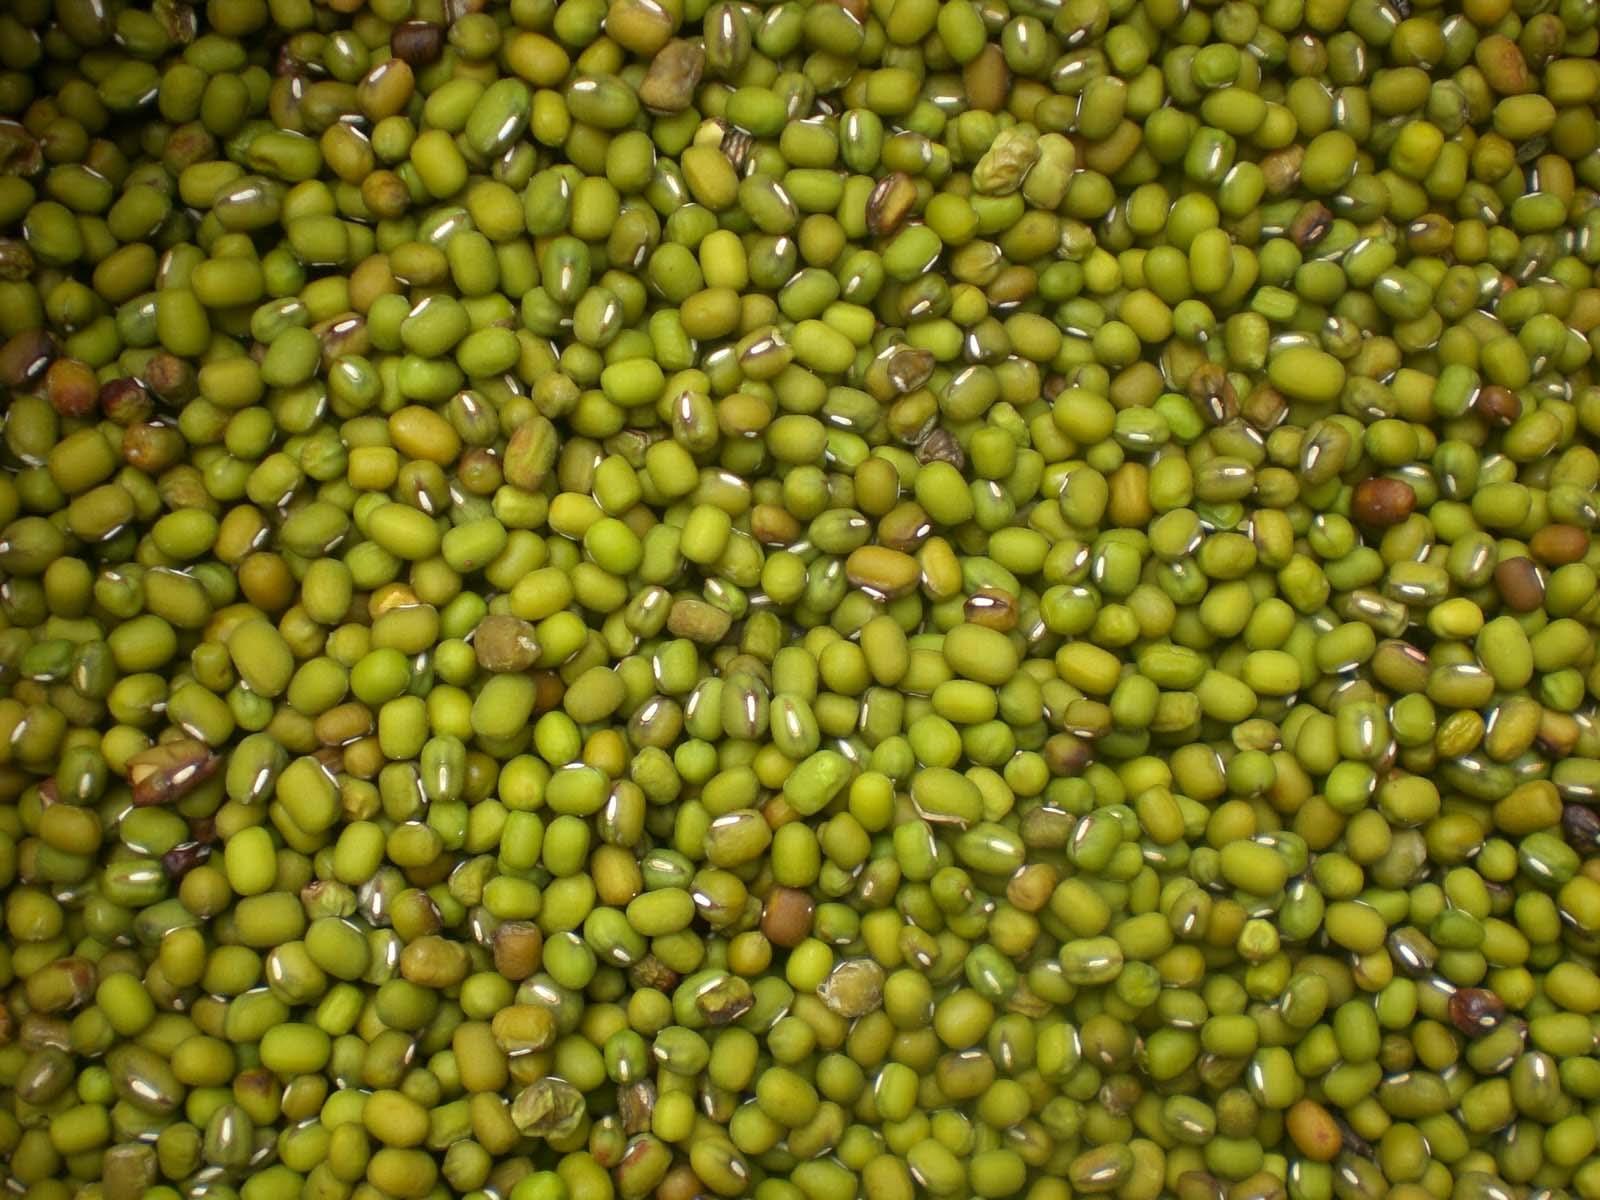 Kacang Hijau, Budidaya Kacang Hijau